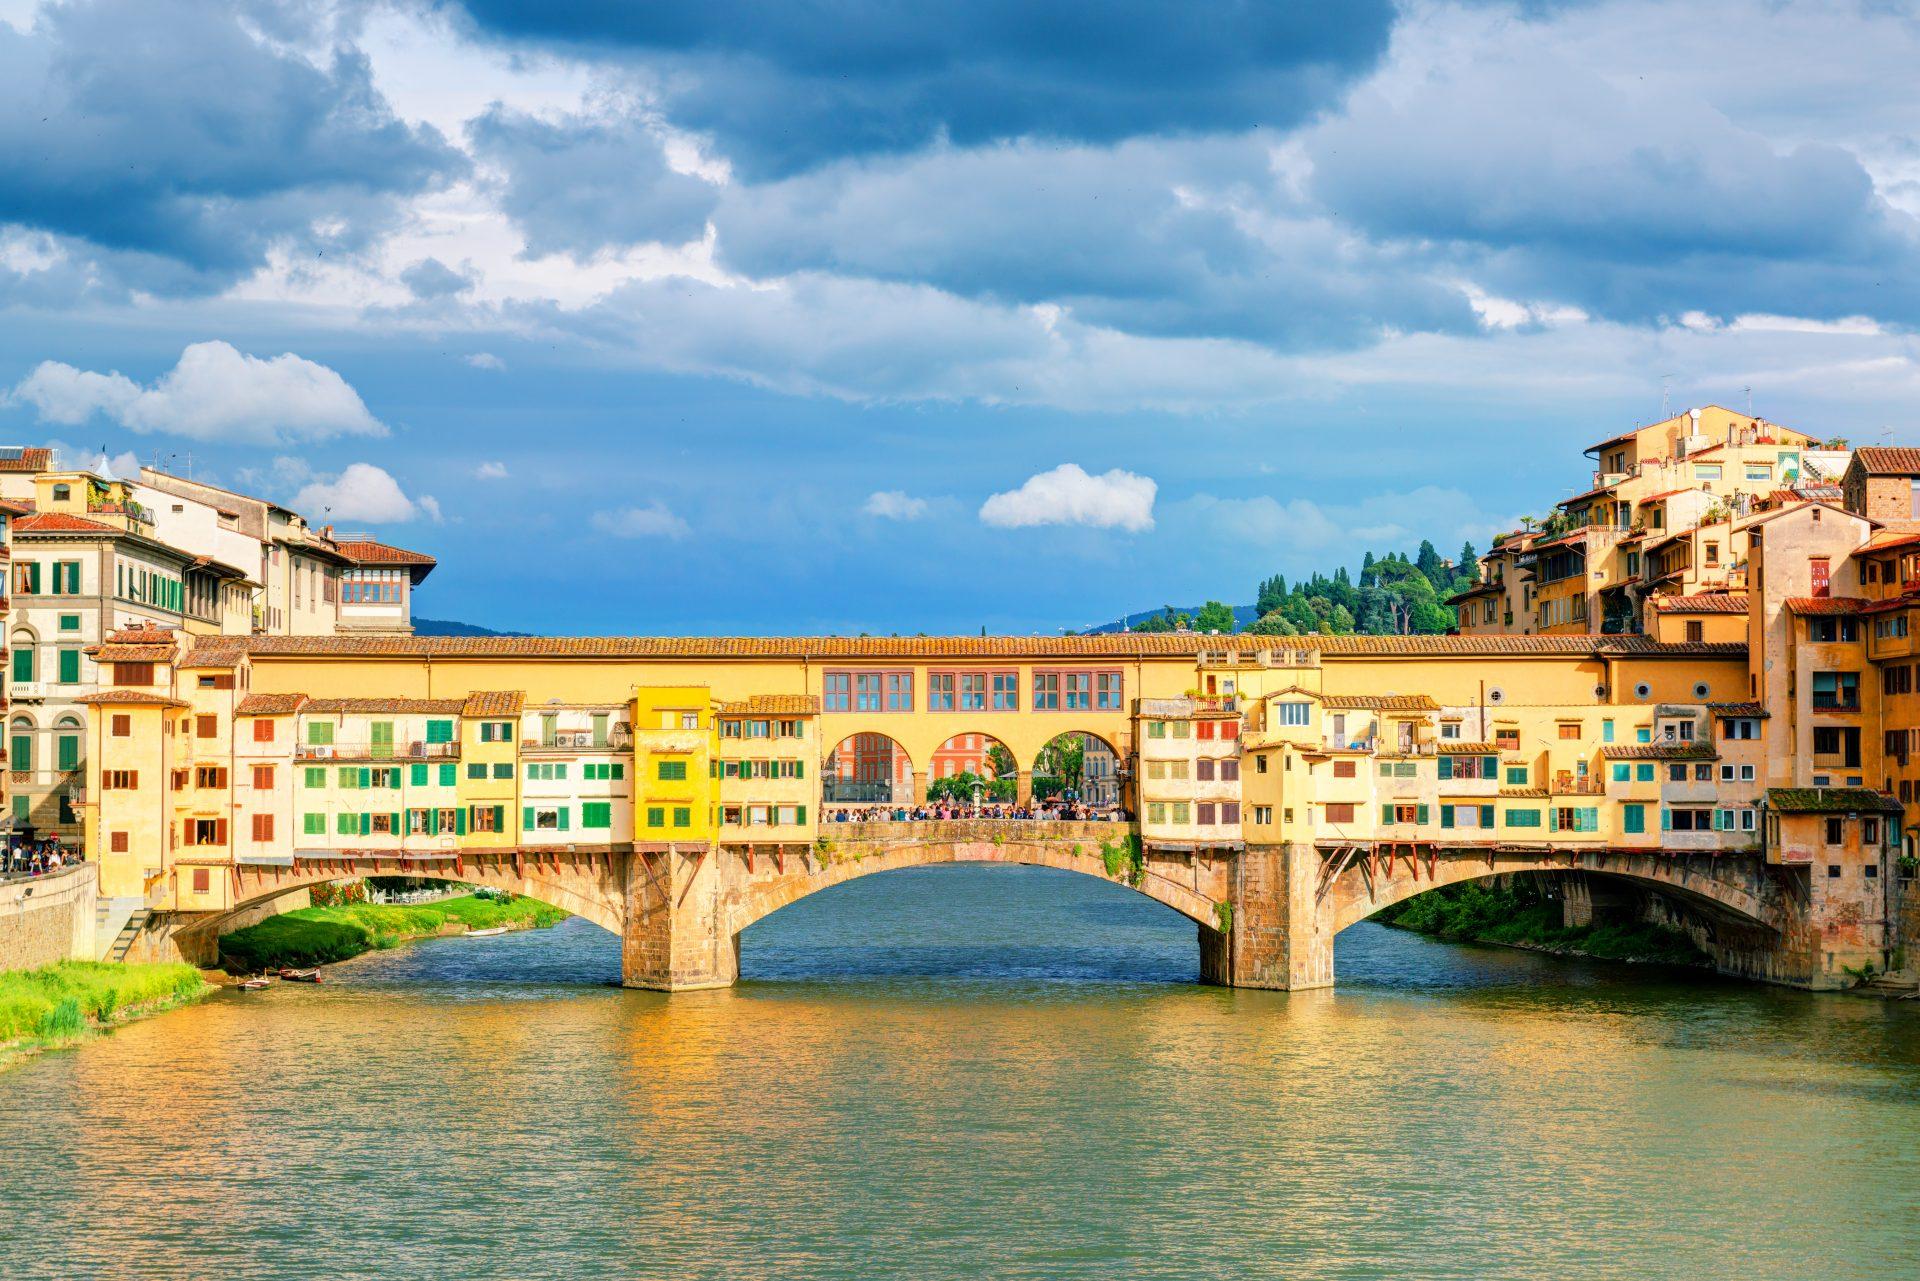 stunning Ponte Vecchio Arch Bridge